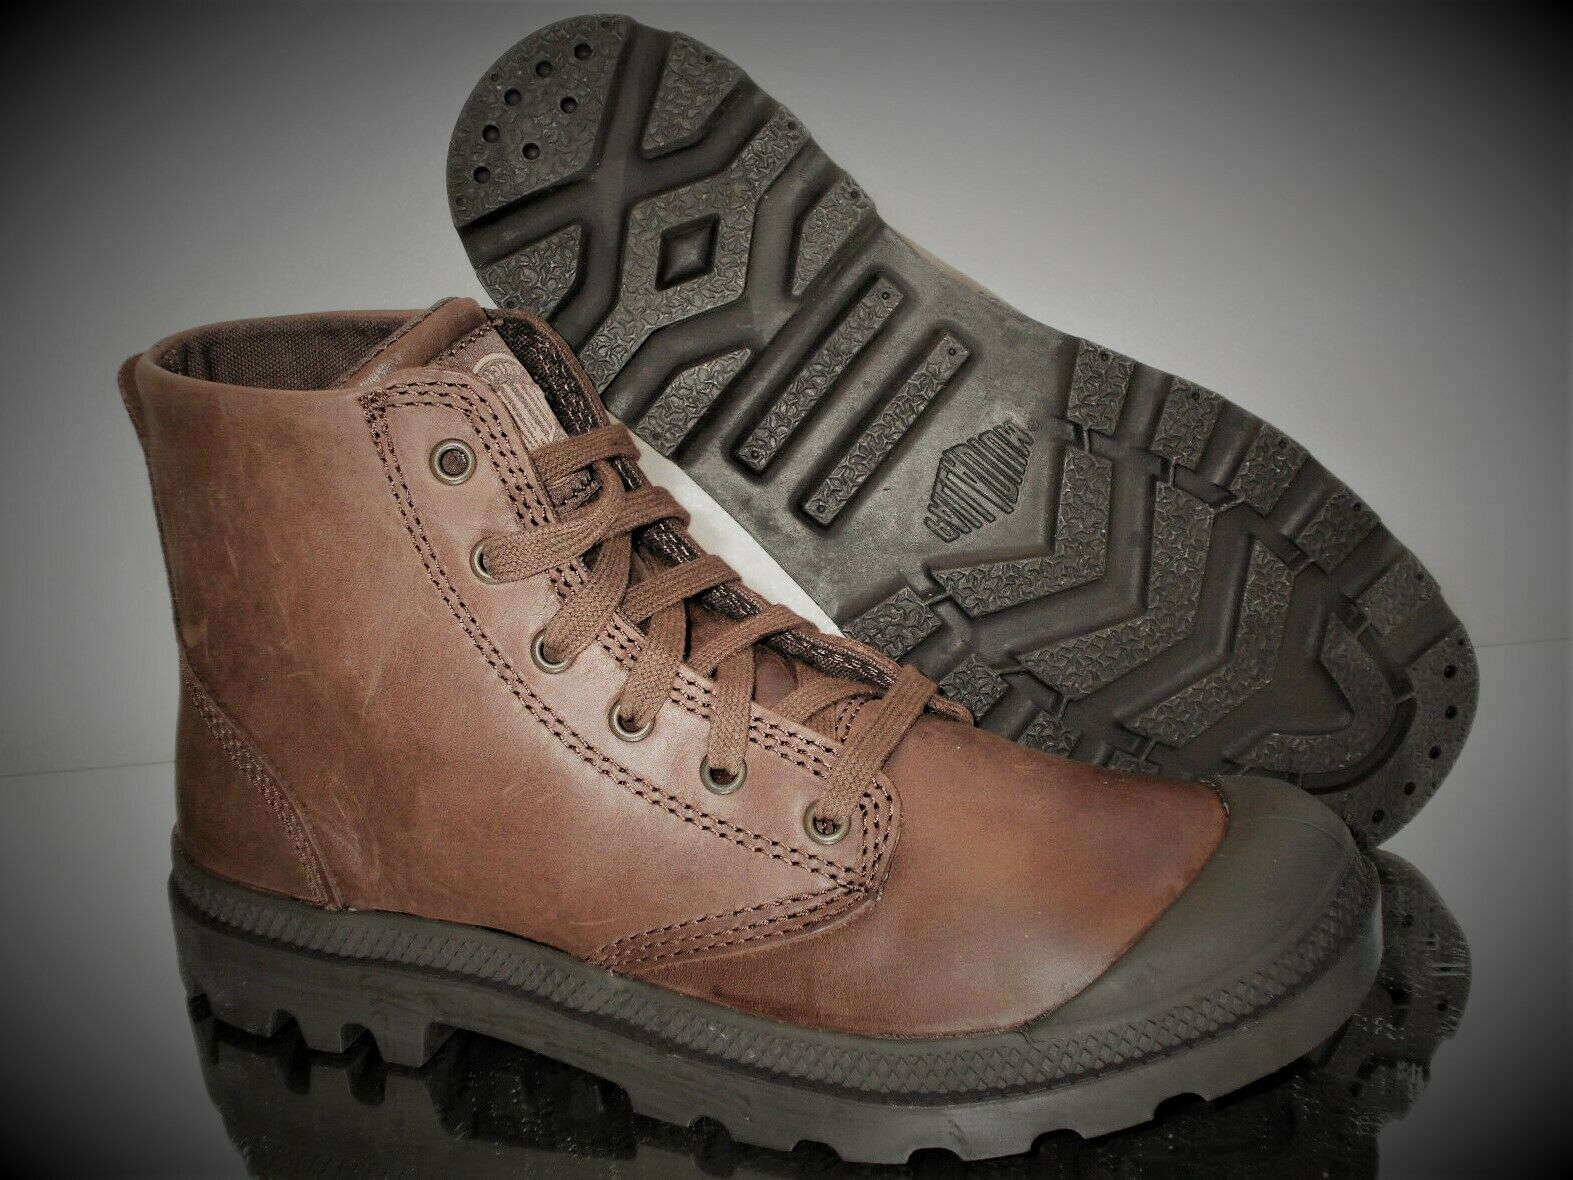 PALLADIUM Pampa HI Leather Mens Stiefel Gr. 41 02355255 Chocolate Neu&OVP